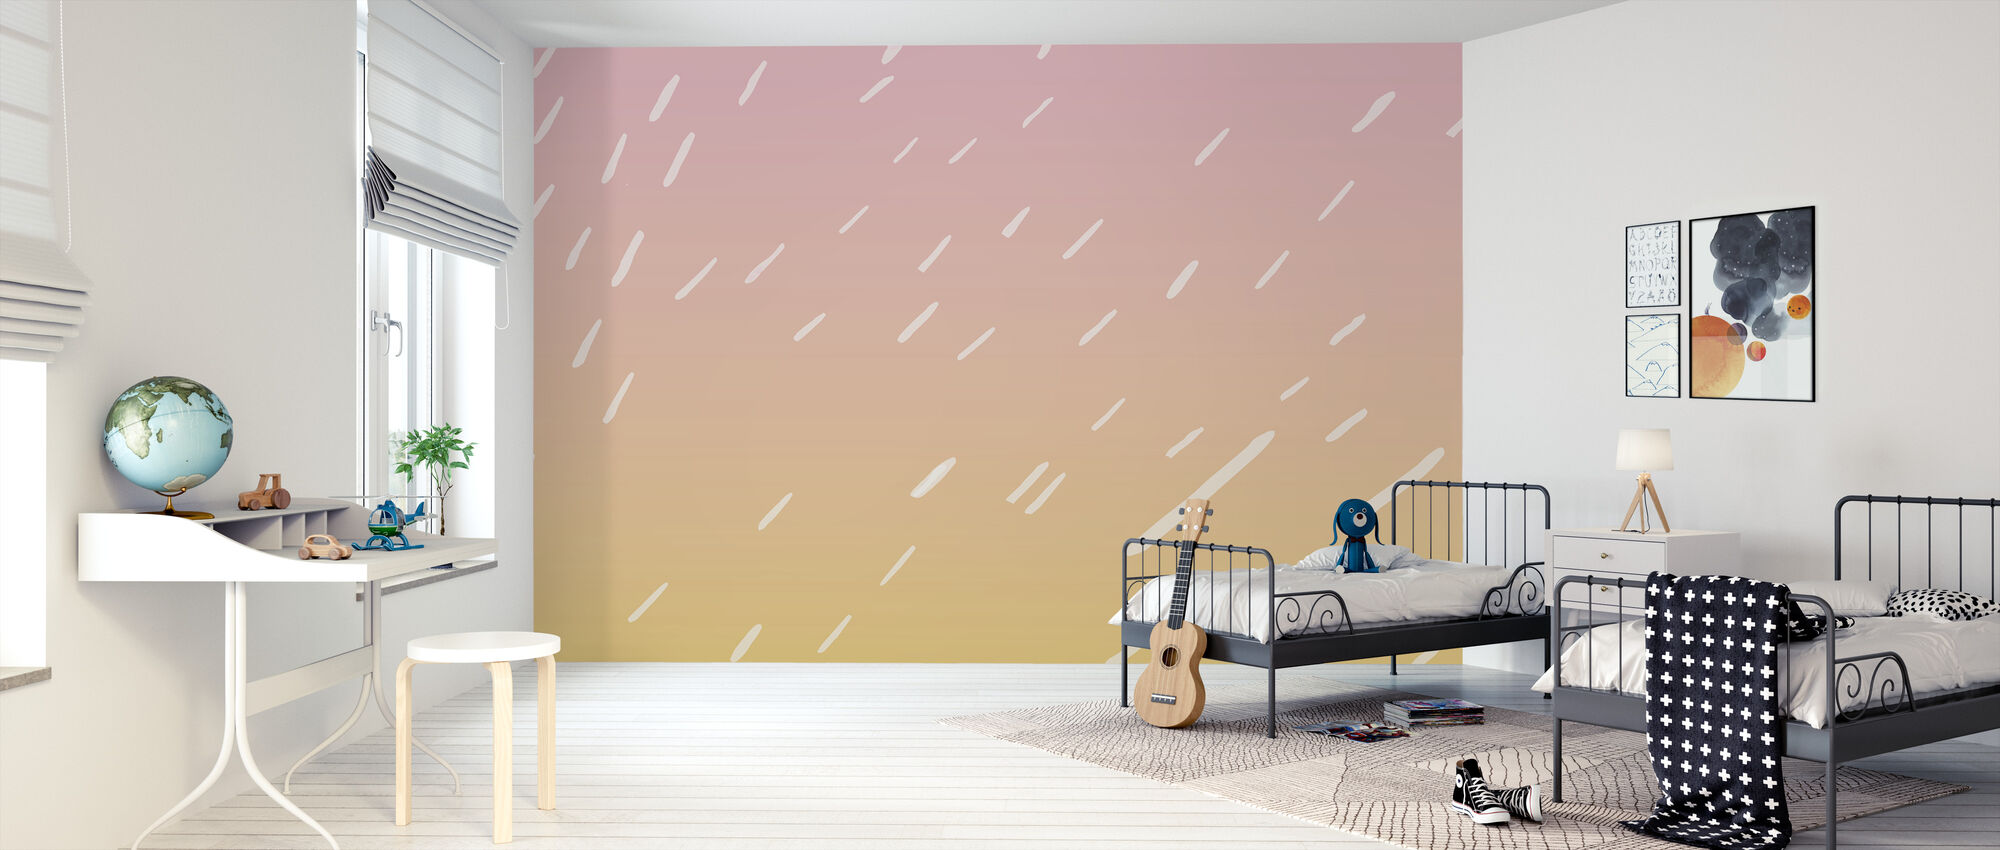 Zomer Regen - Behang - Kinderkamer